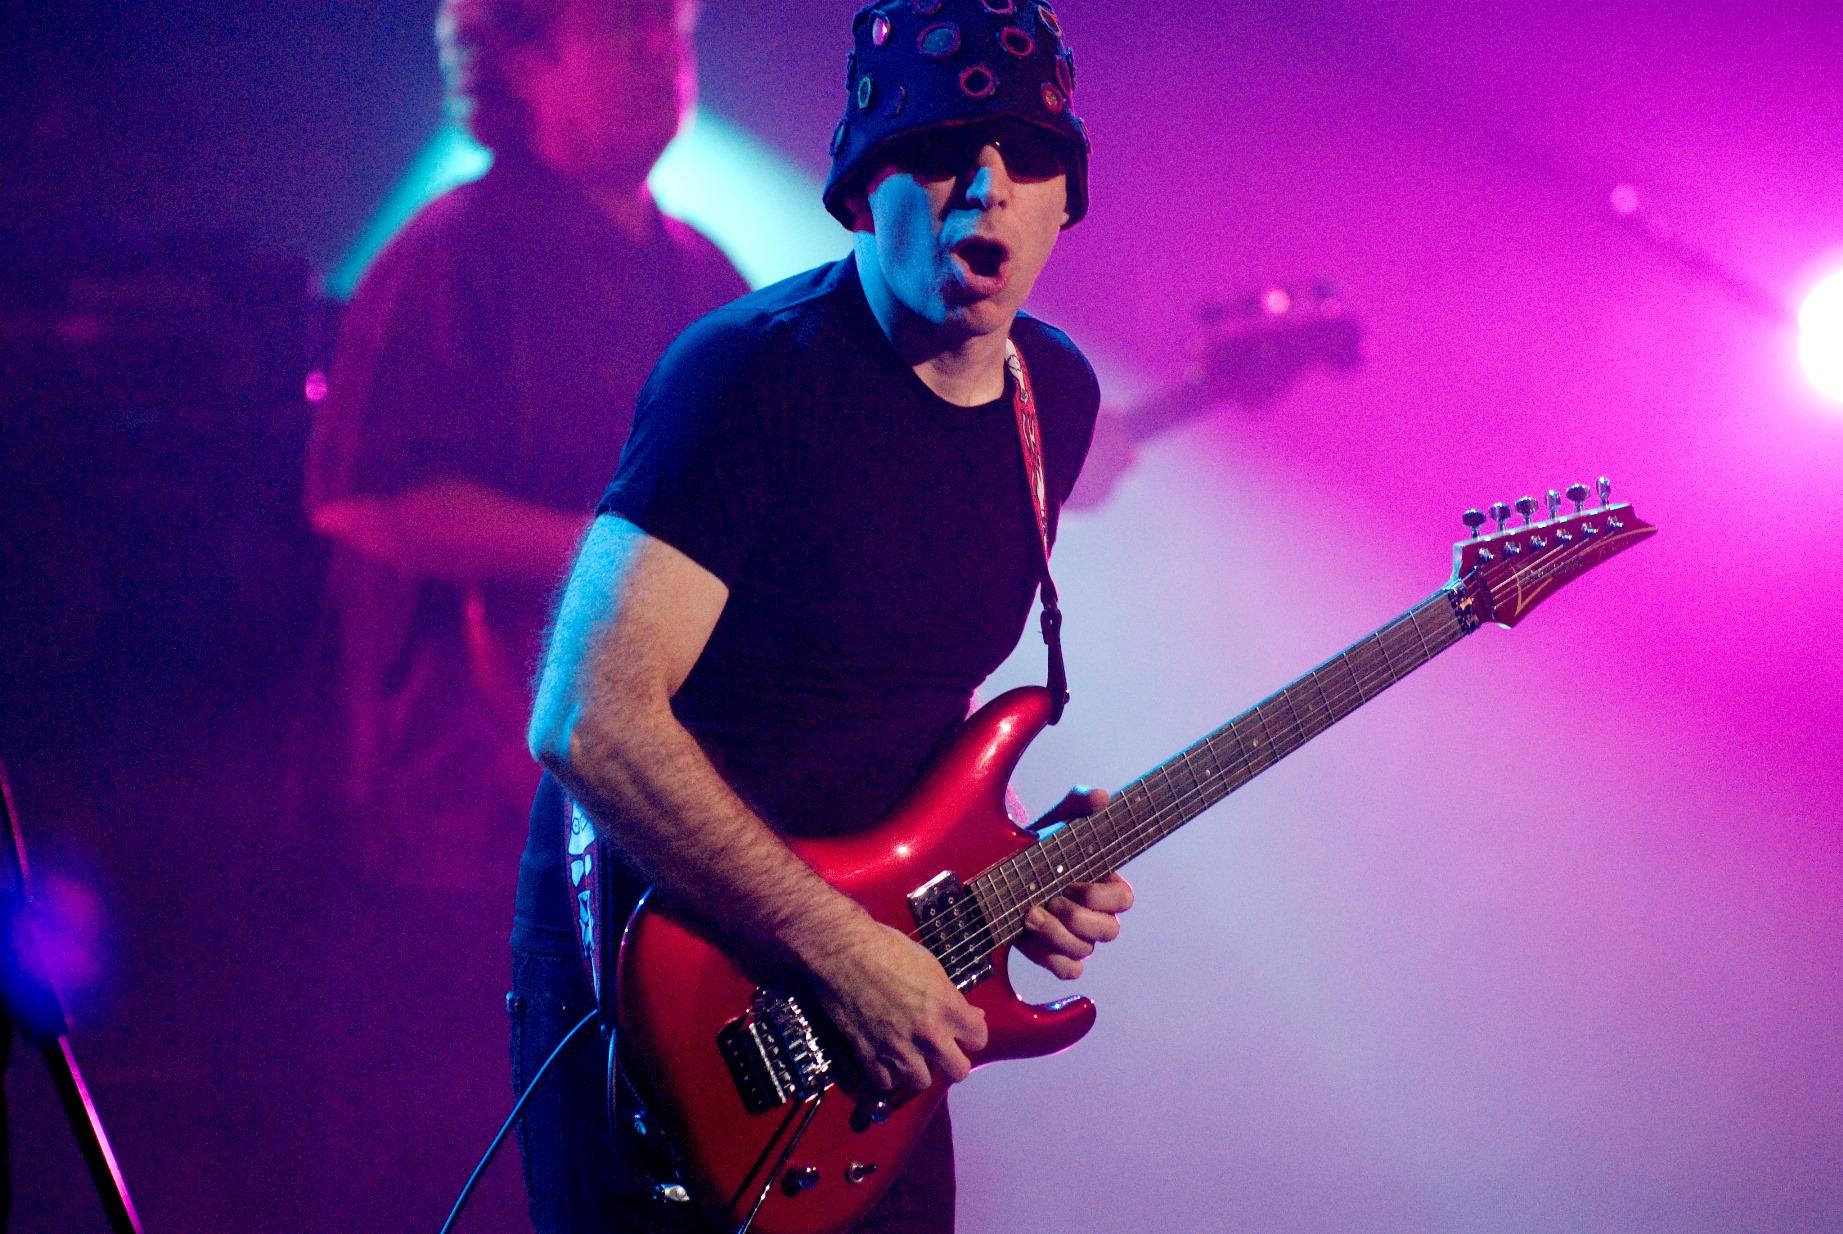 Joe-Satriani-Goes-On-Tour-2016